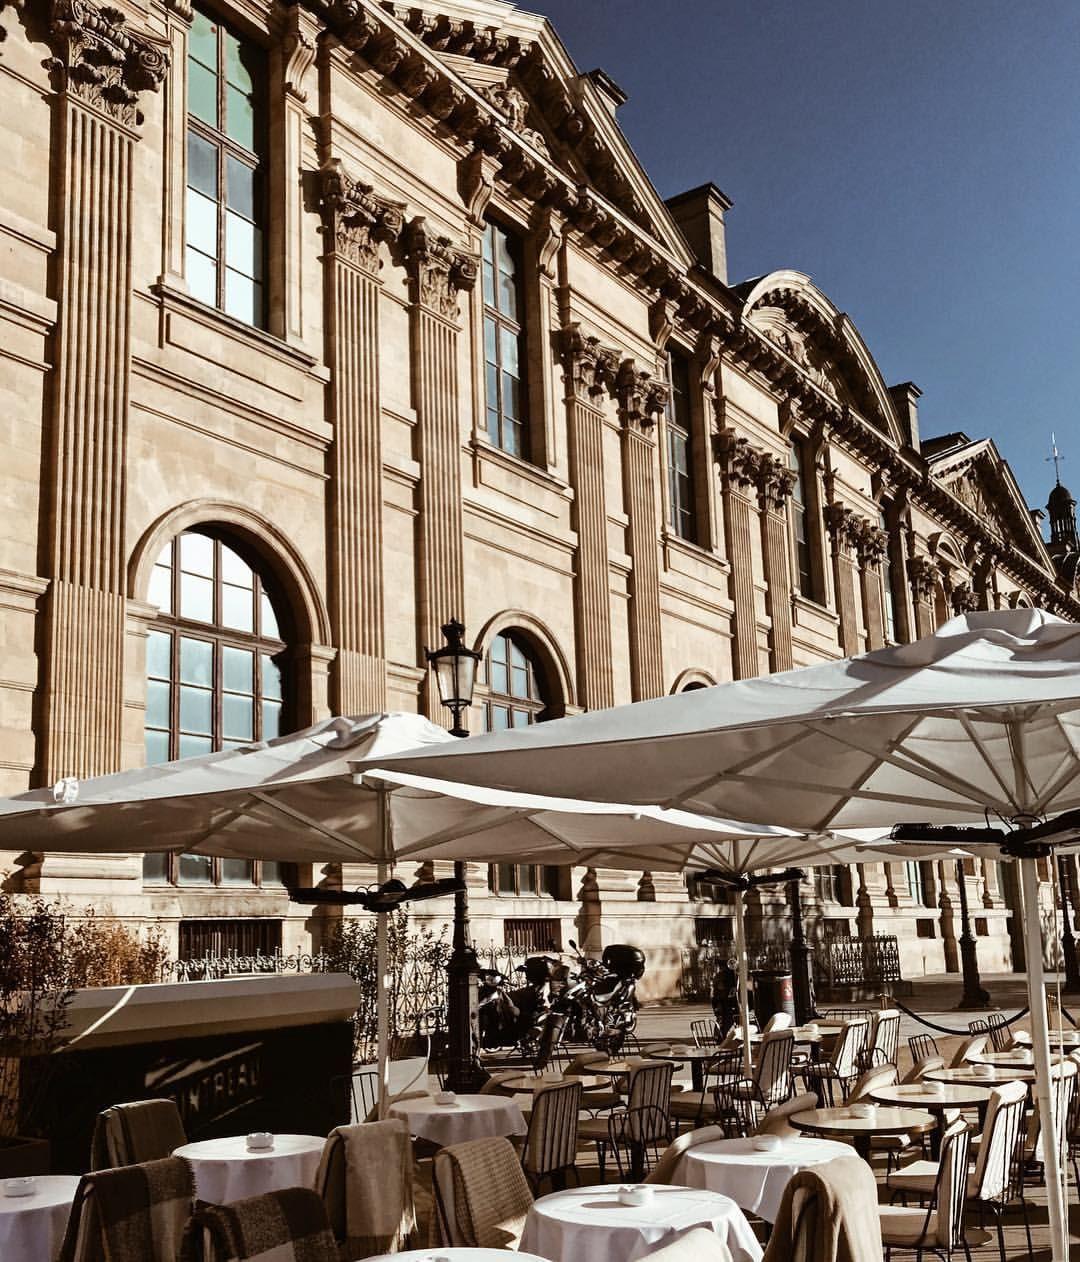 Lou Lou Restaurant Le Louvre Museum Paris Expensive But Worth The Experience Italian Restaurant In Paris Vacation France Paris Restaurants Louvre